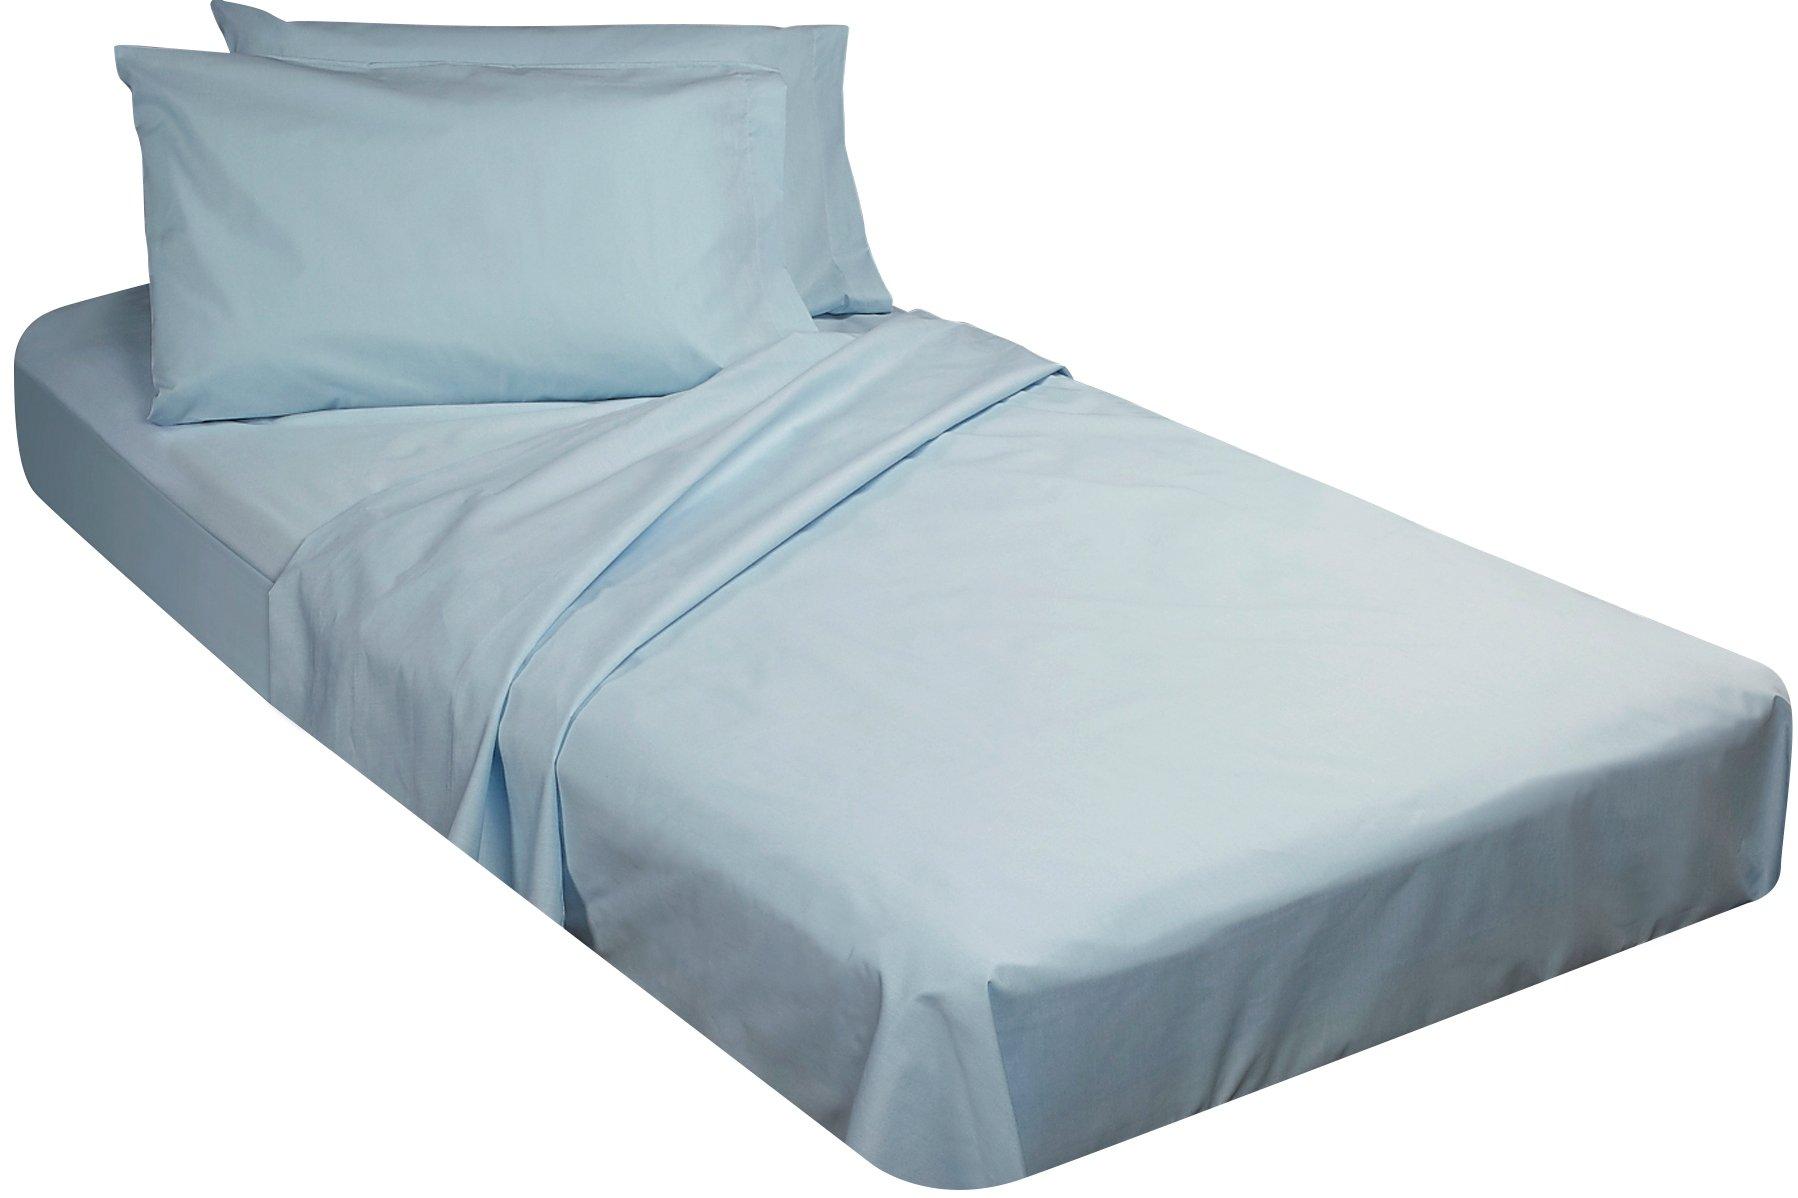 Gilbin College Dorm Cotton Twin Extra Long 4 Piece Sheet Set (Sky Blue)